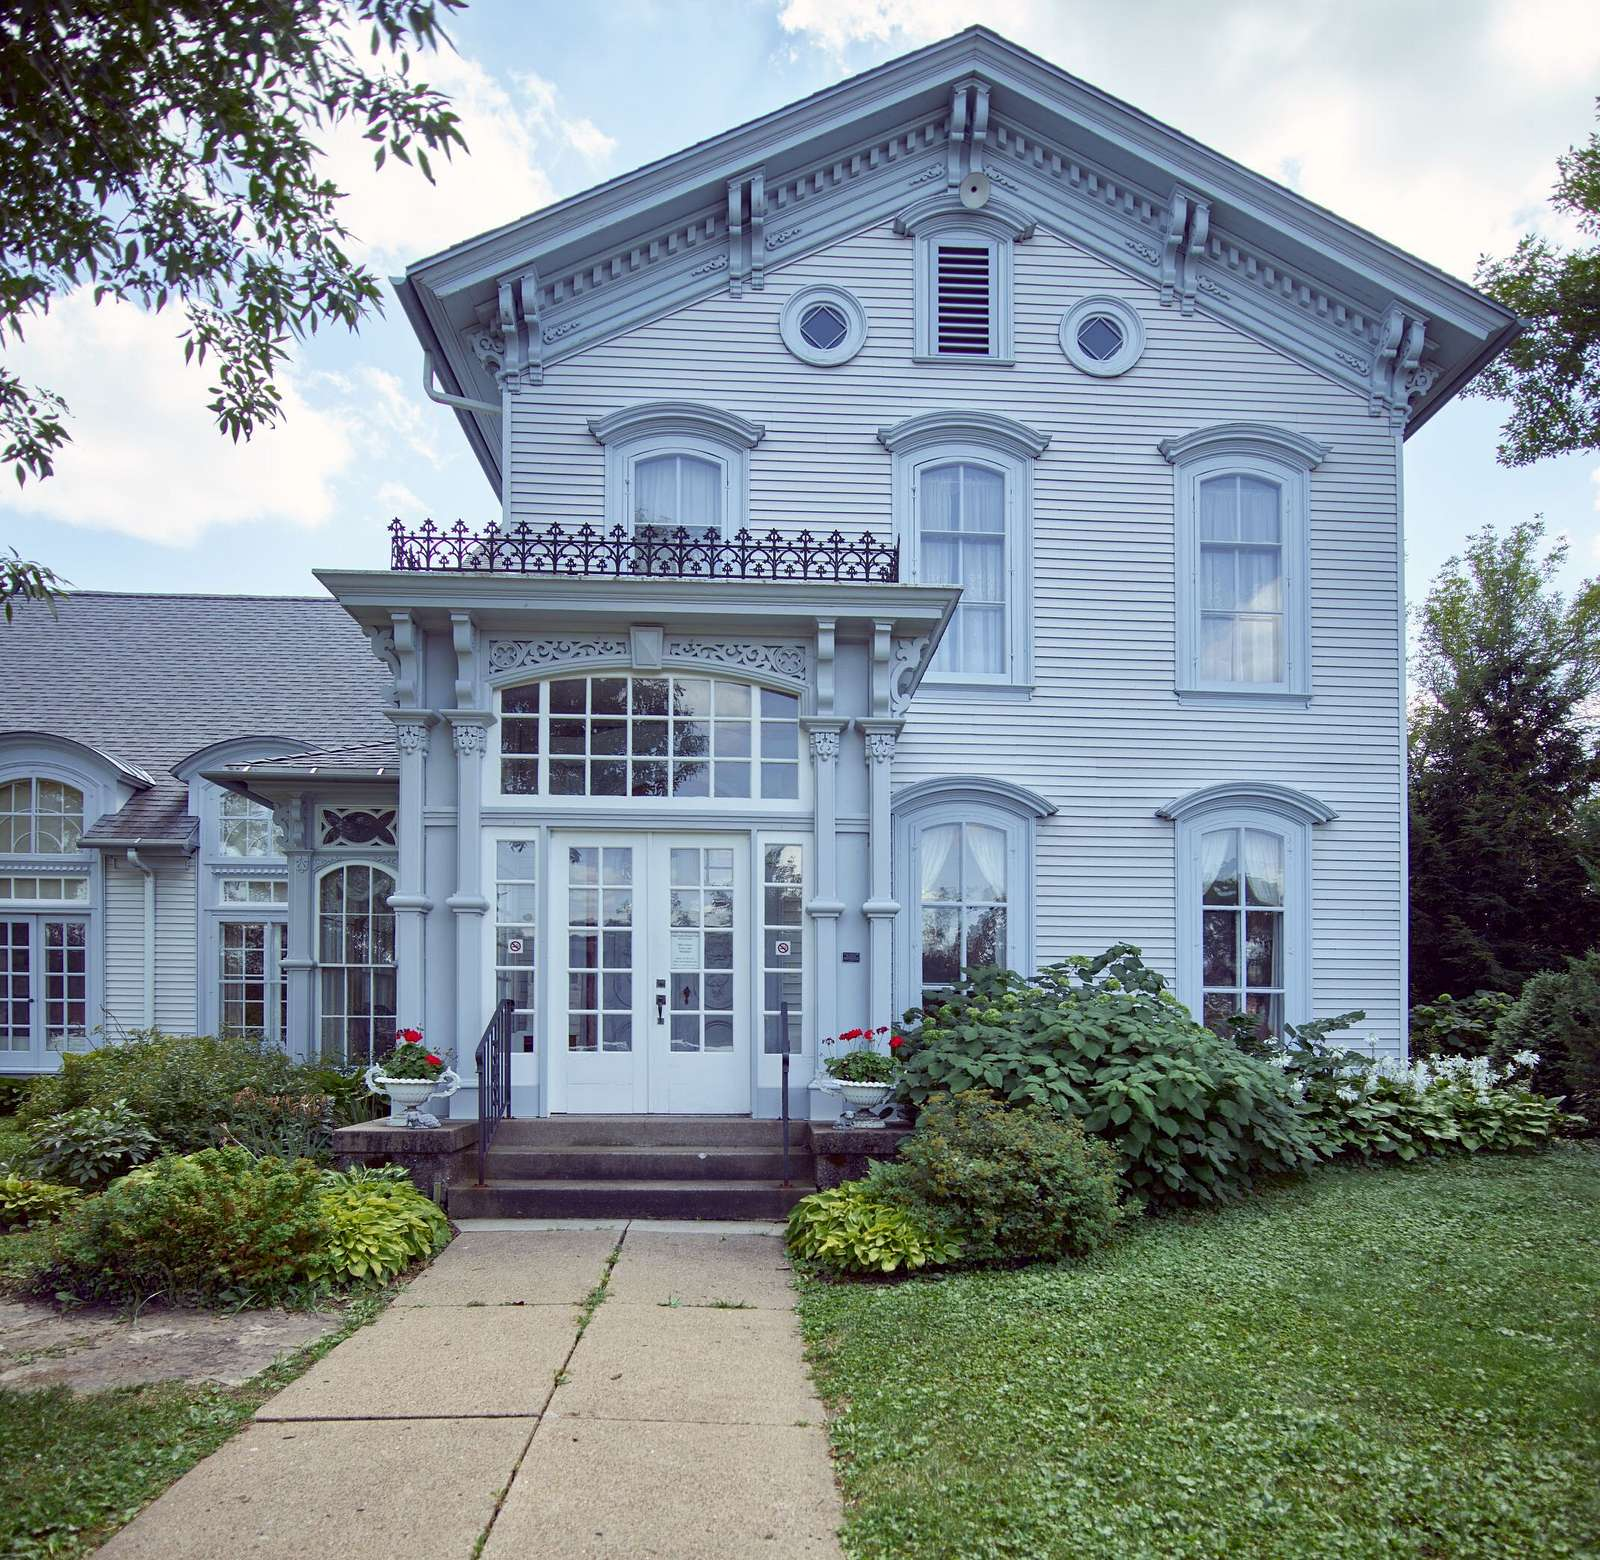 The stately home of the Cedar Falls Woman's Club in Cedar Falls, Iowa